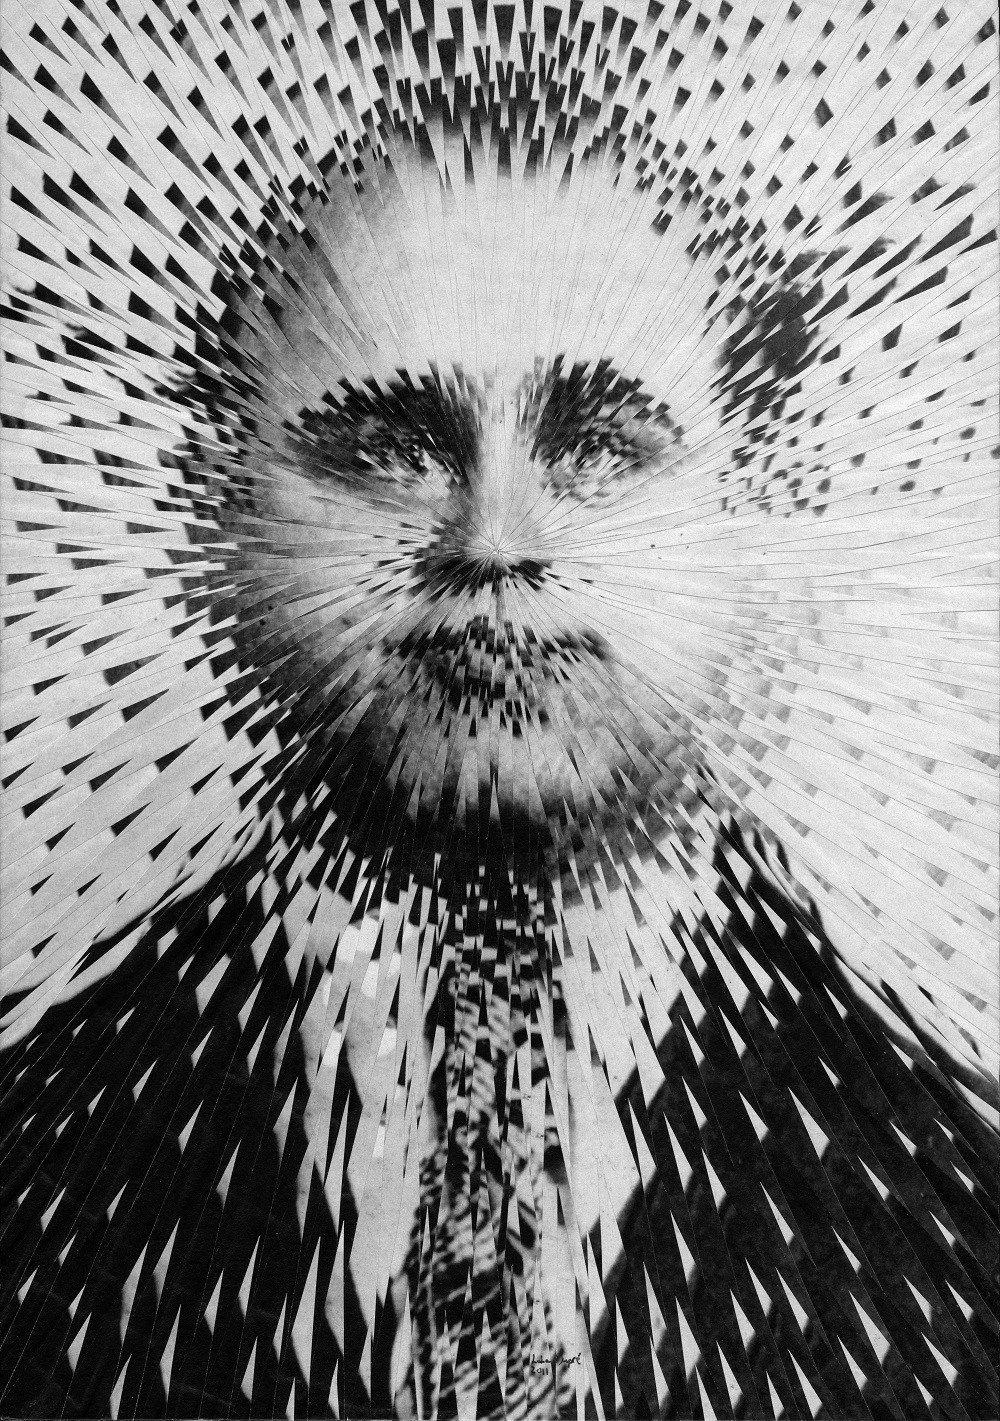 SHRAPNEL by Lola Dupre #bw #collage